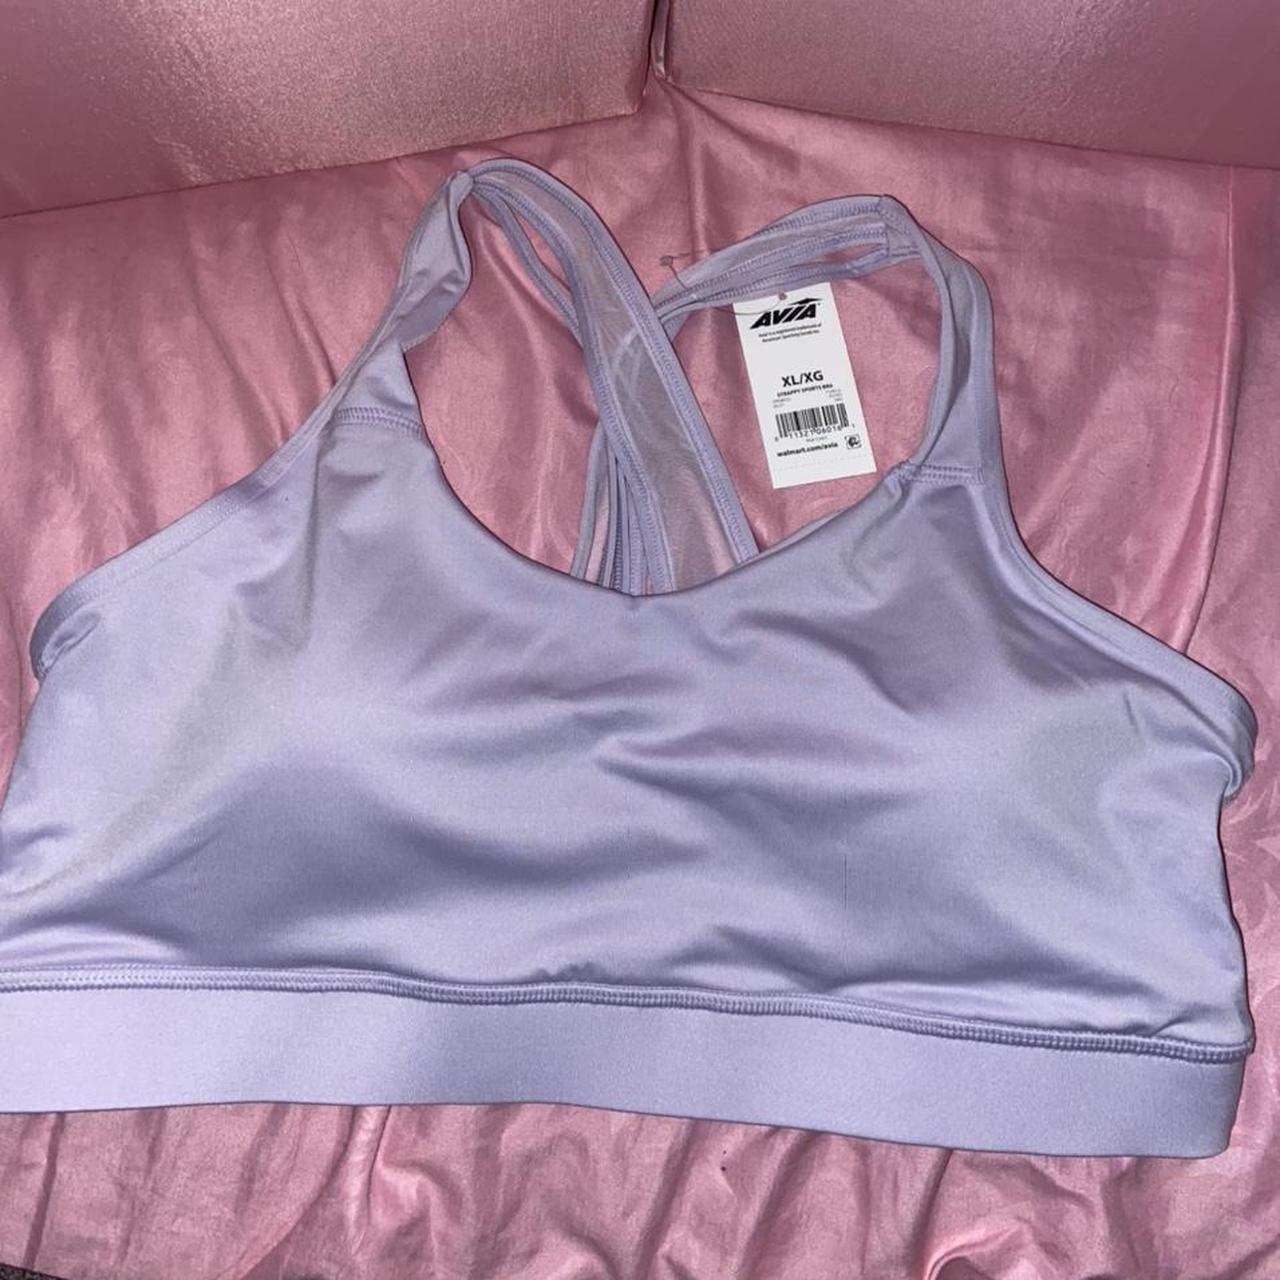 Product Image 1 - AVIA Sprortswear sports bra. Size